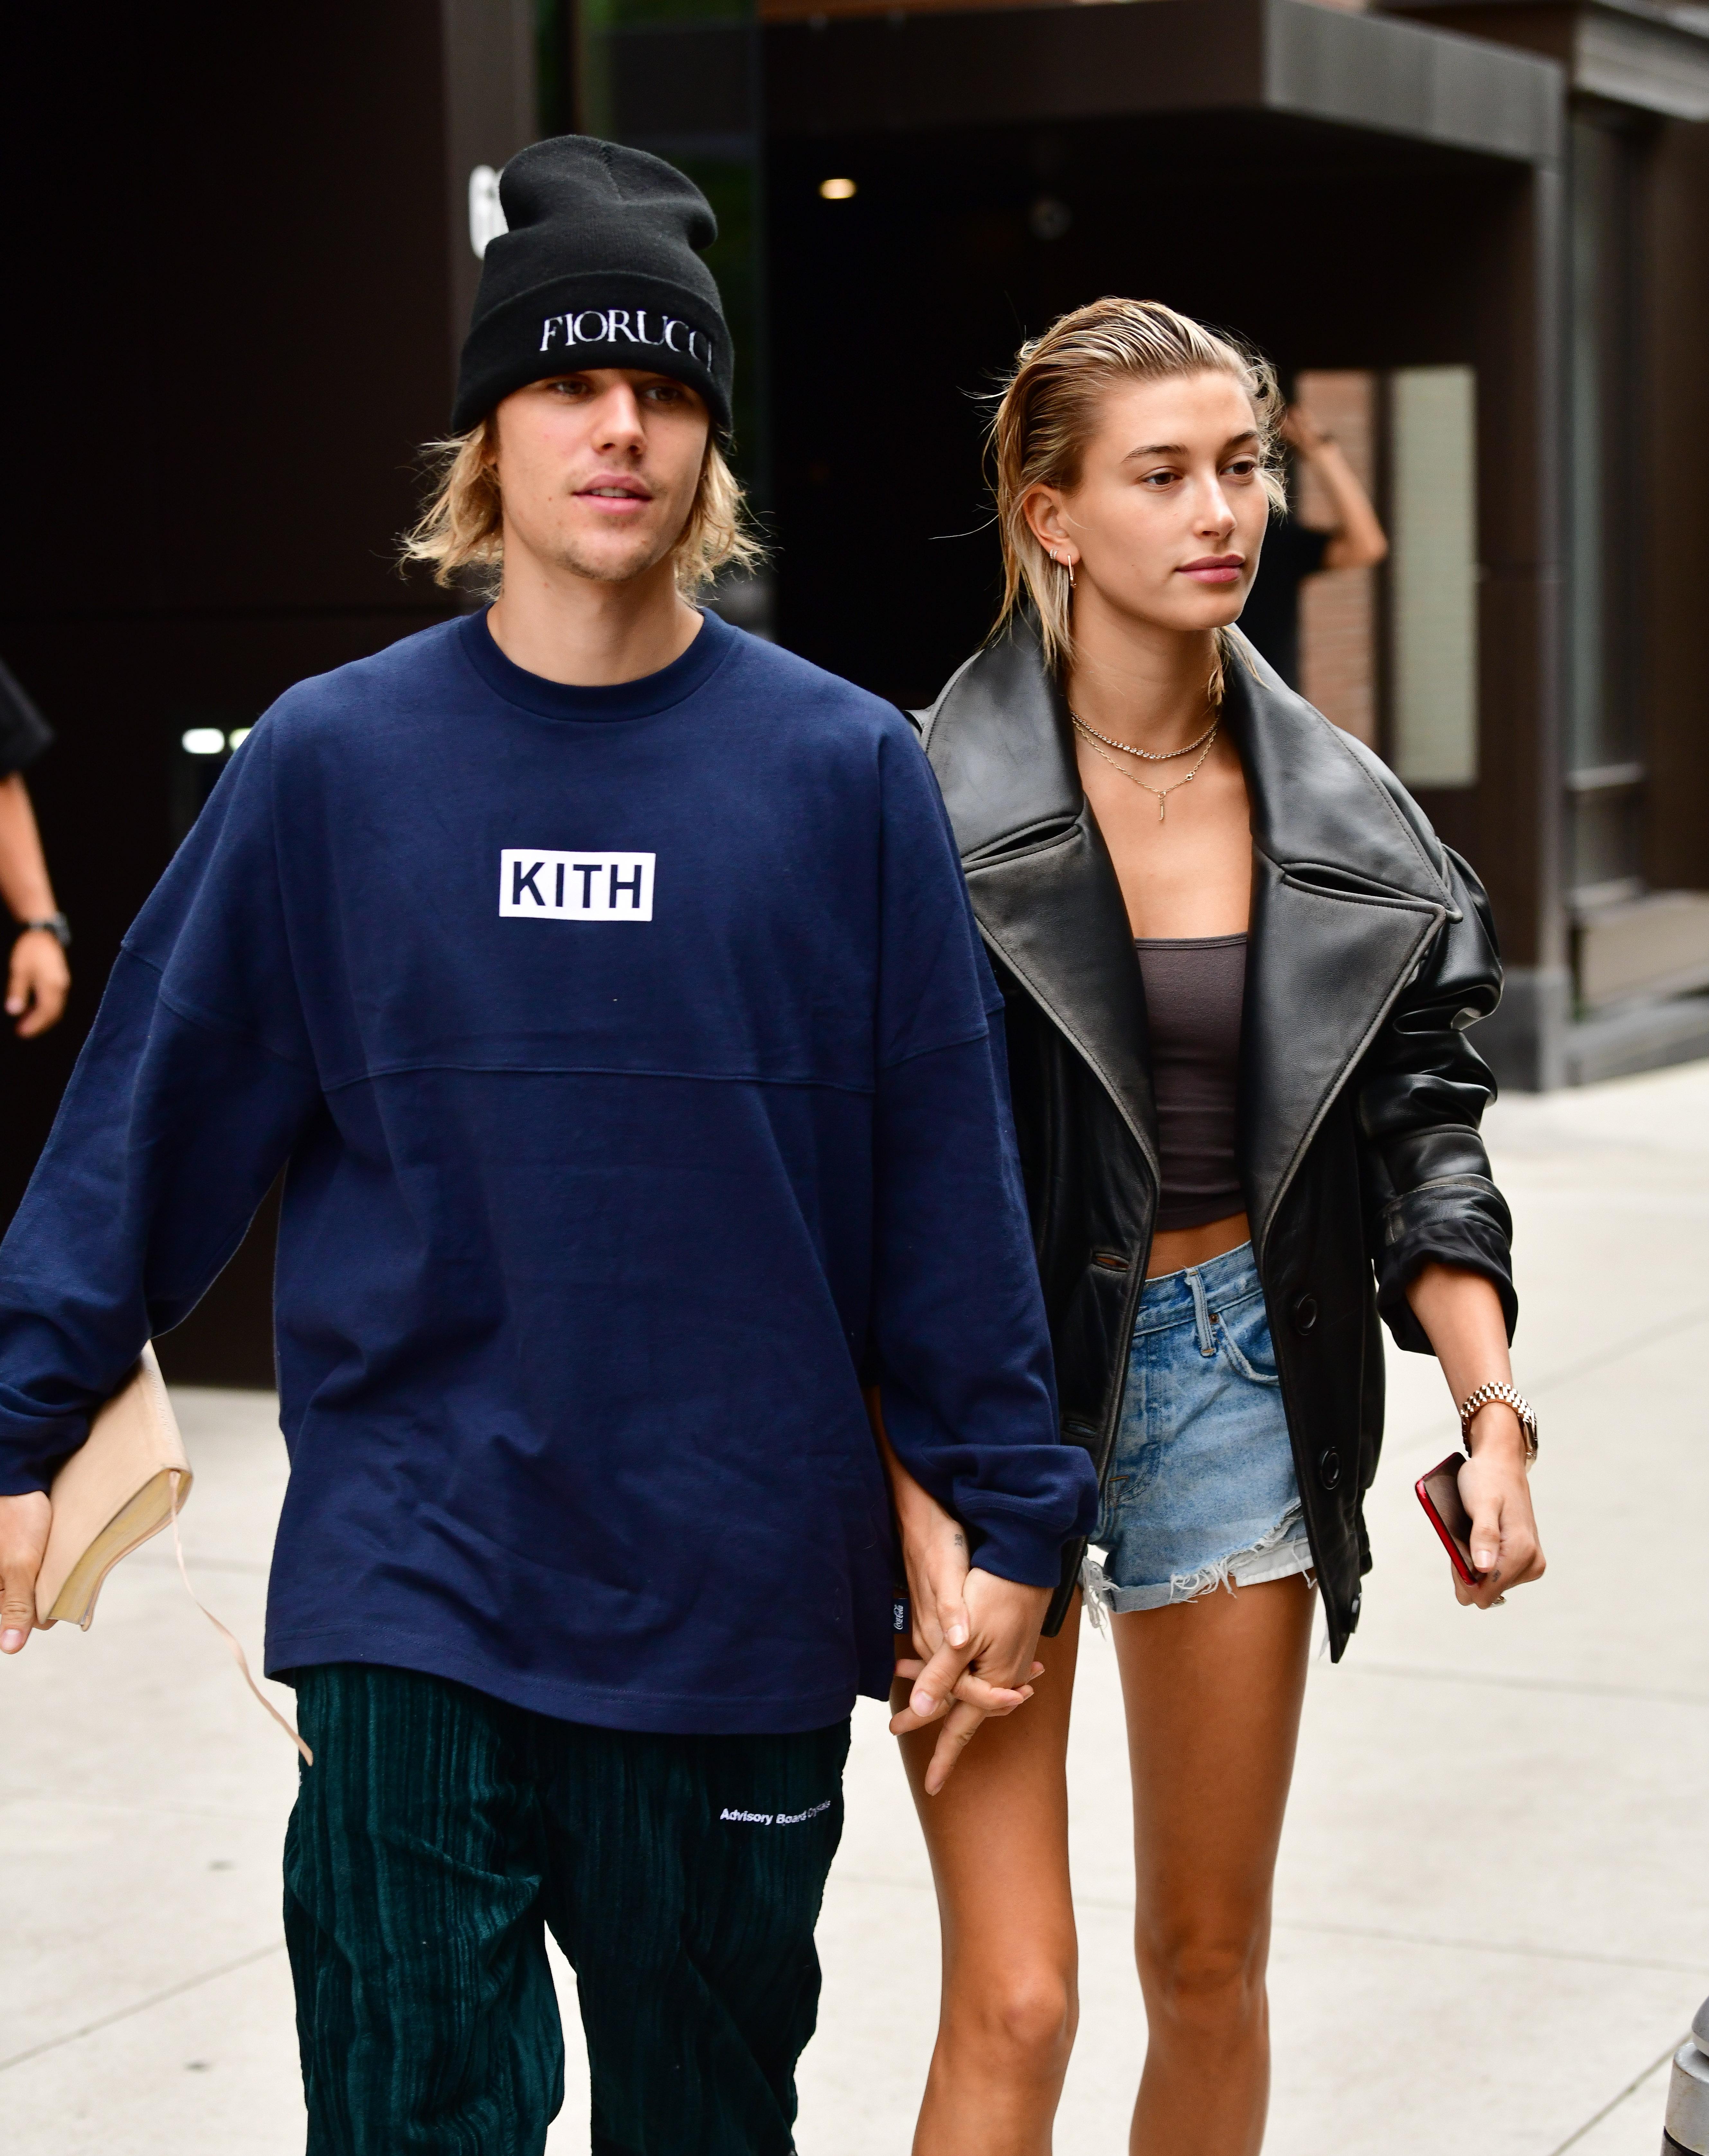 justin bieber and hailey baldwin walking together